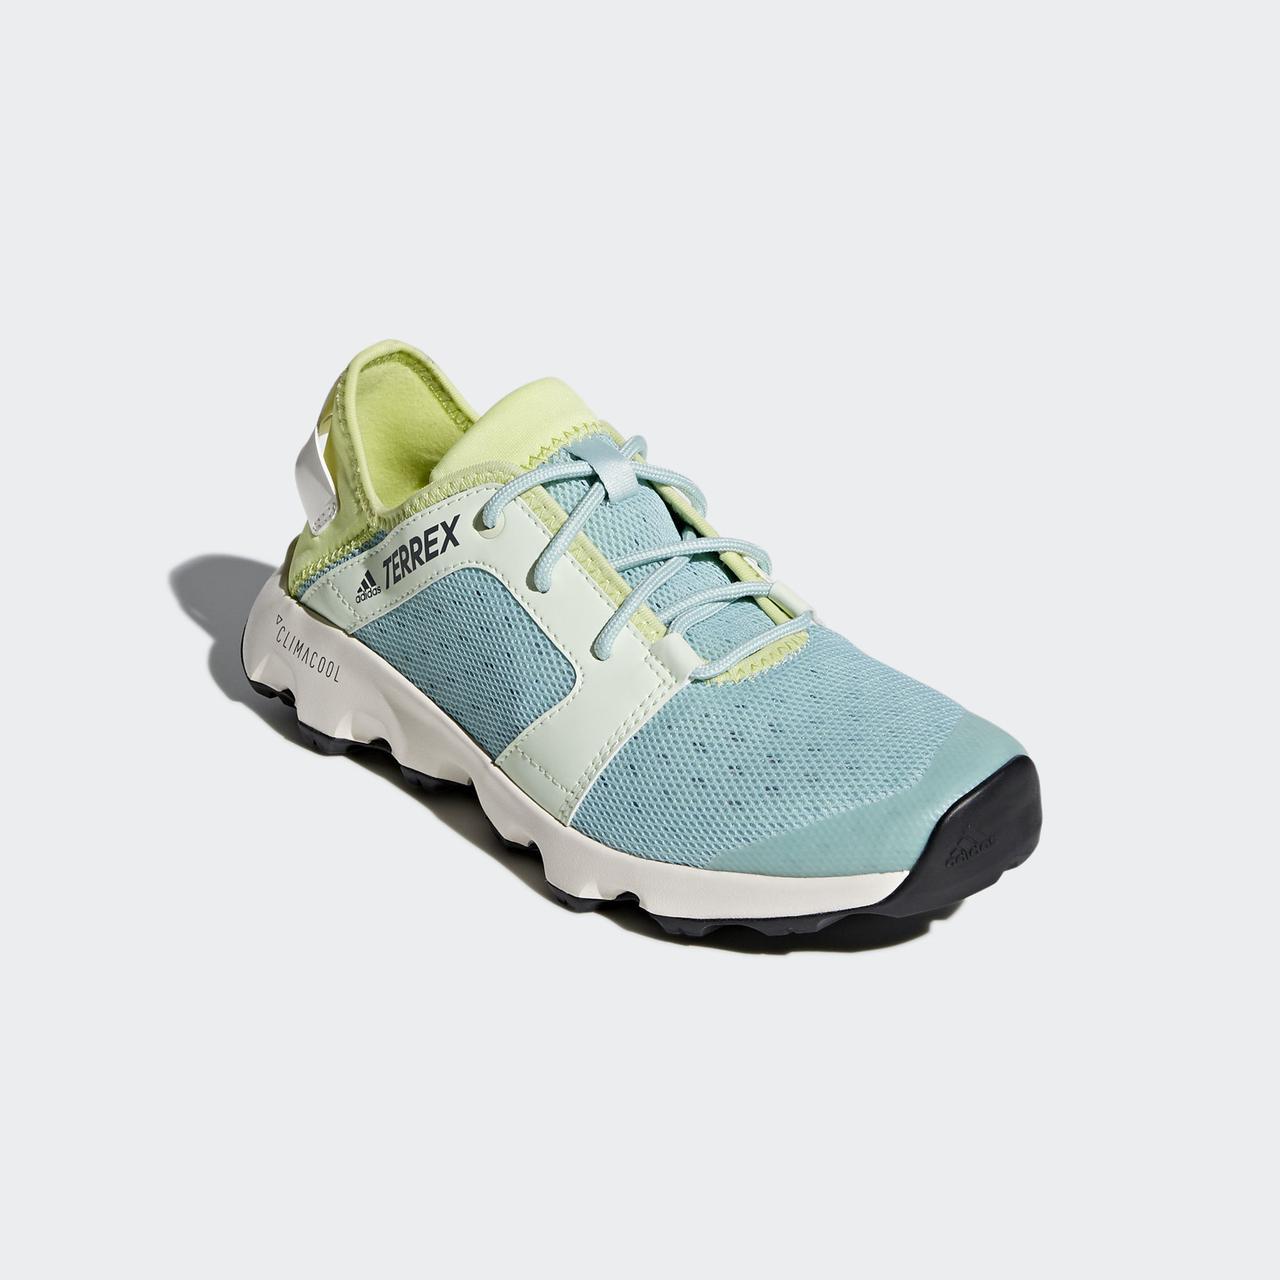 b0c69aef ... Женские кроссовки Adidas Performance Terrex CC Voyager Sleek (Артикул:  CM7544), ...